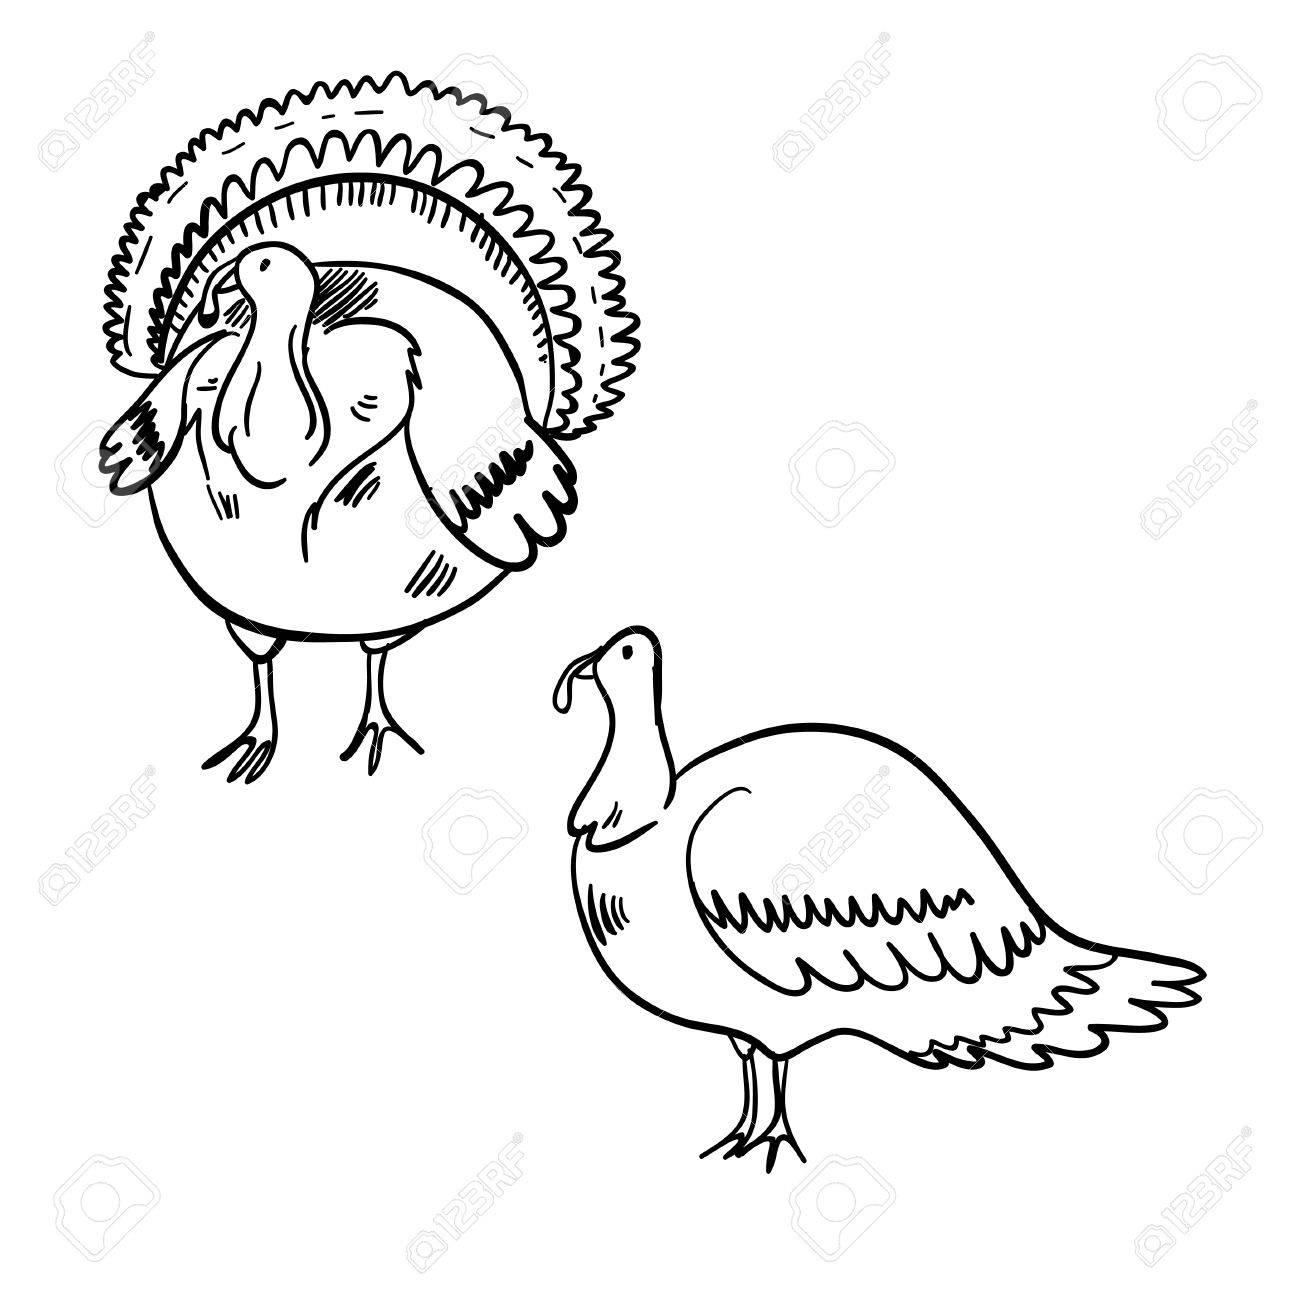 1300x1300 Vector Illustration With Two Turkeys. Funny Cartoon Wonderful